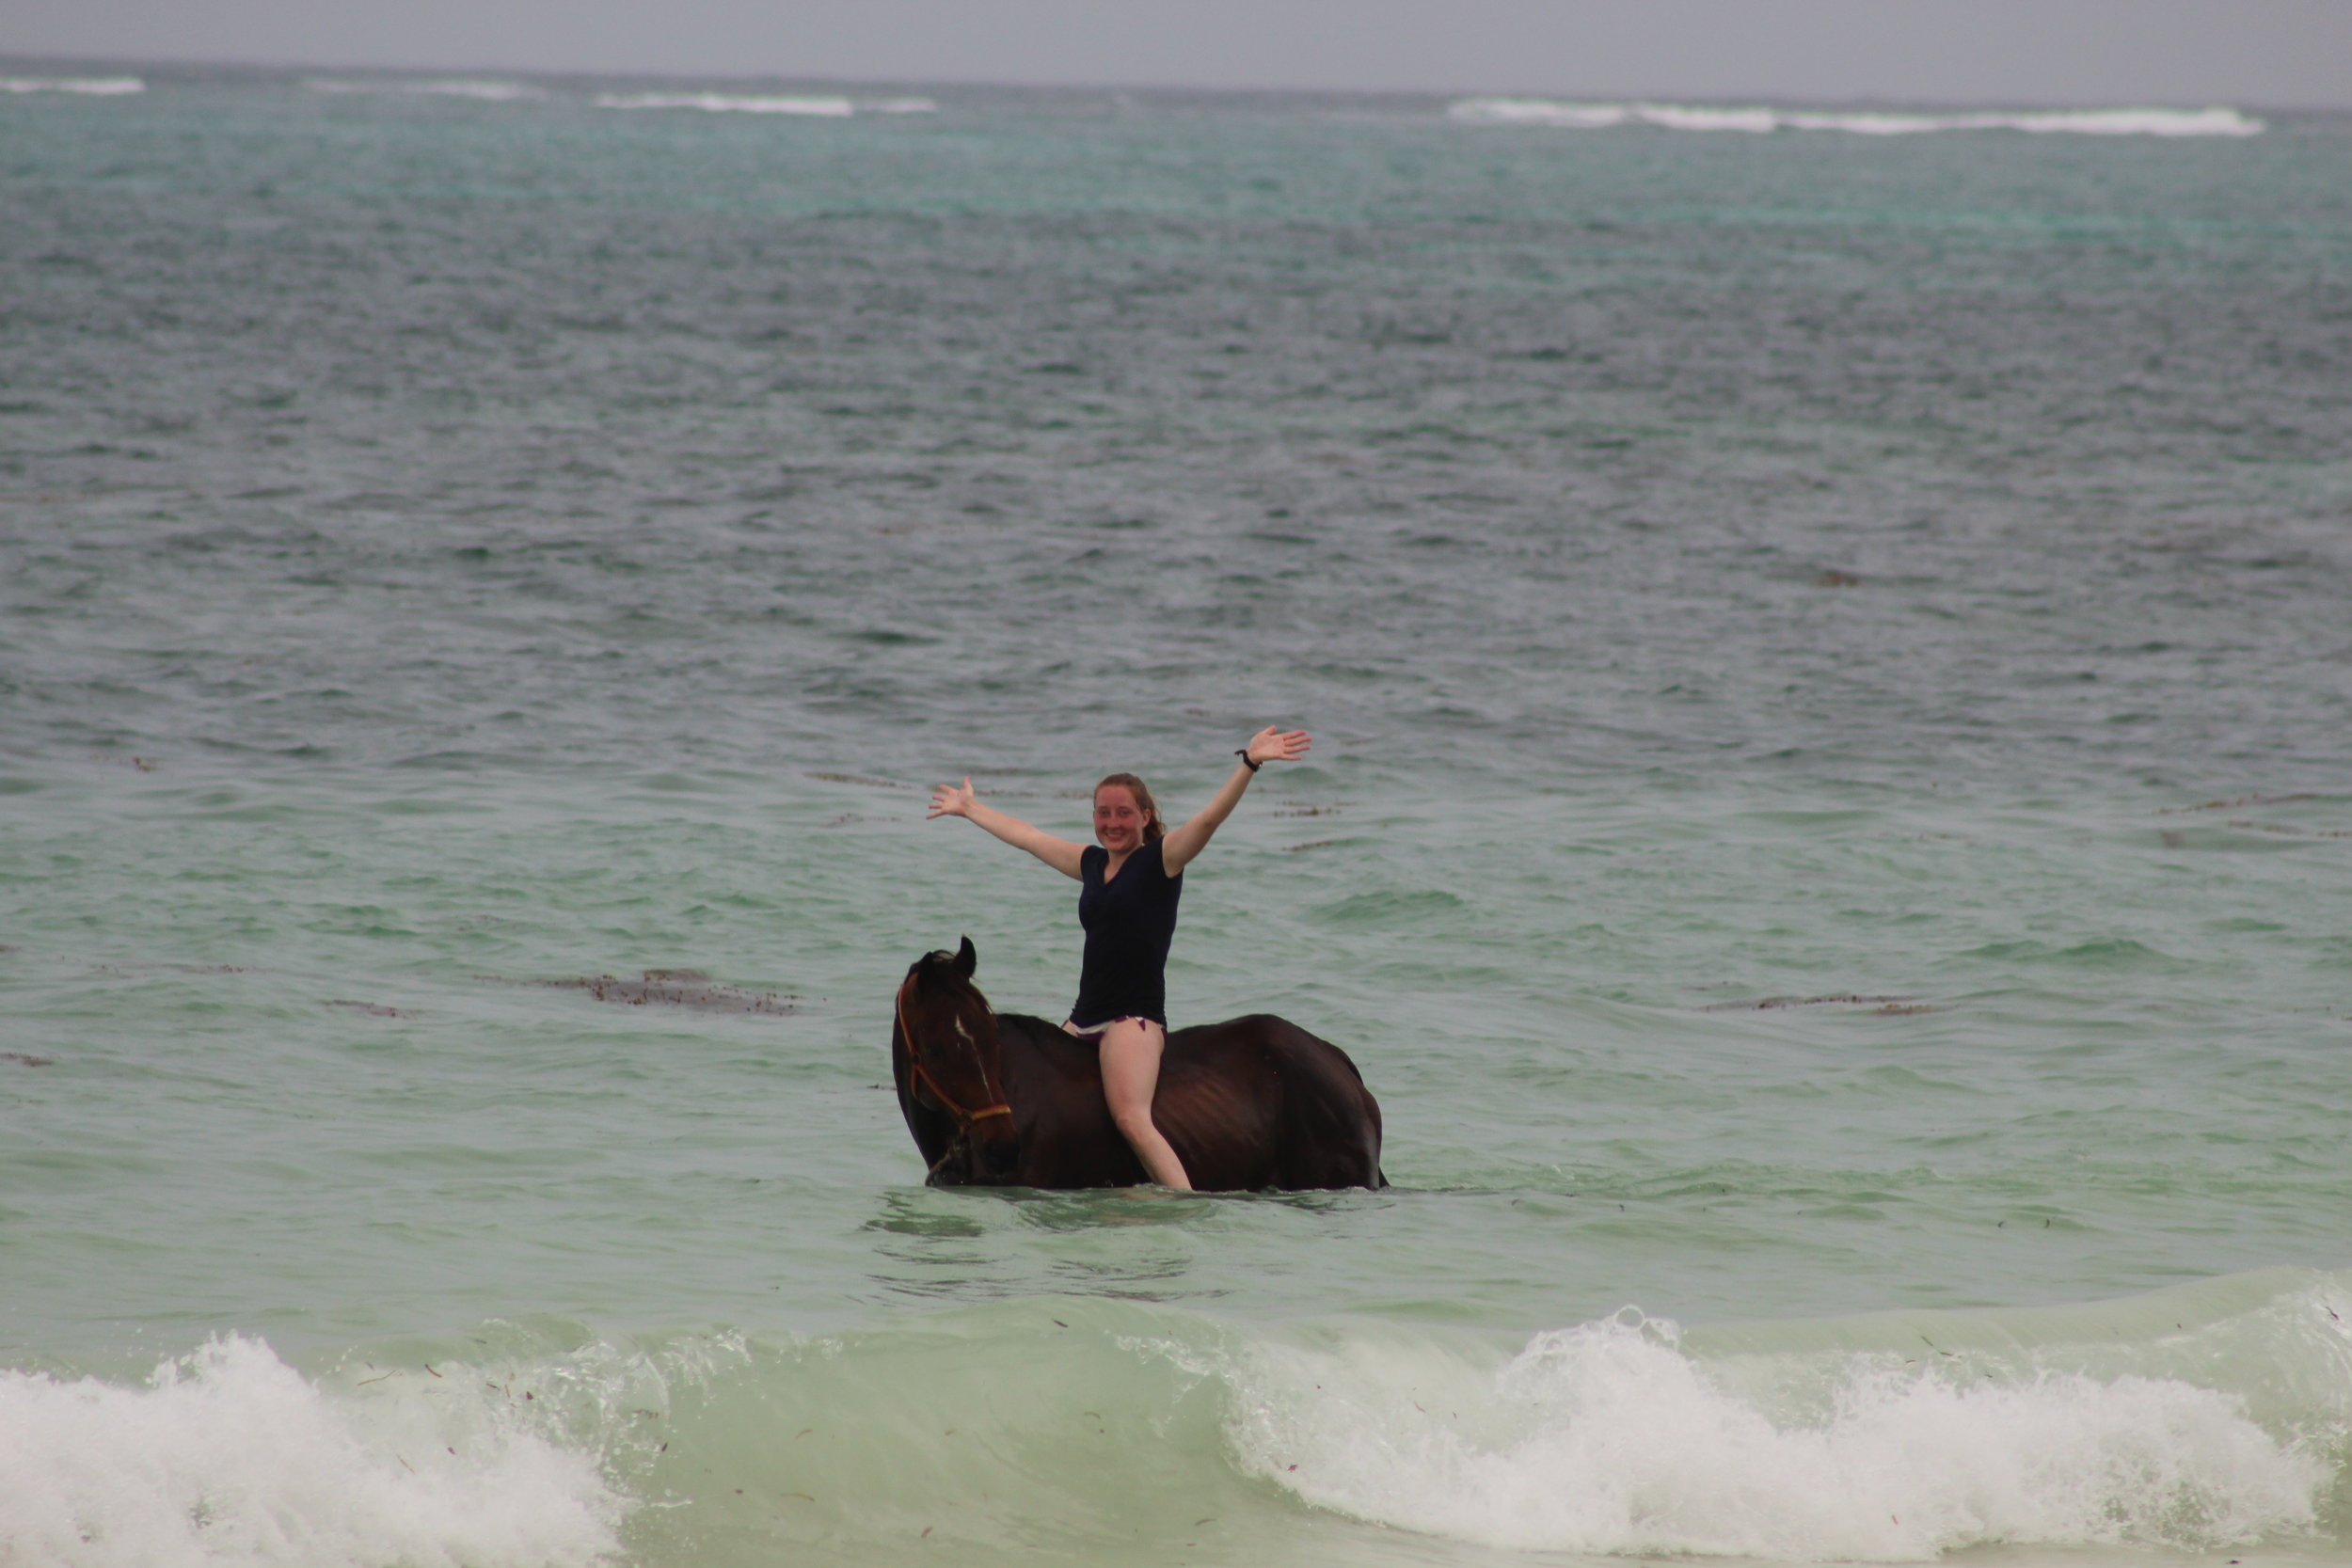 Horseback riding in the ocean in Kiwengwa, Zanzibar.